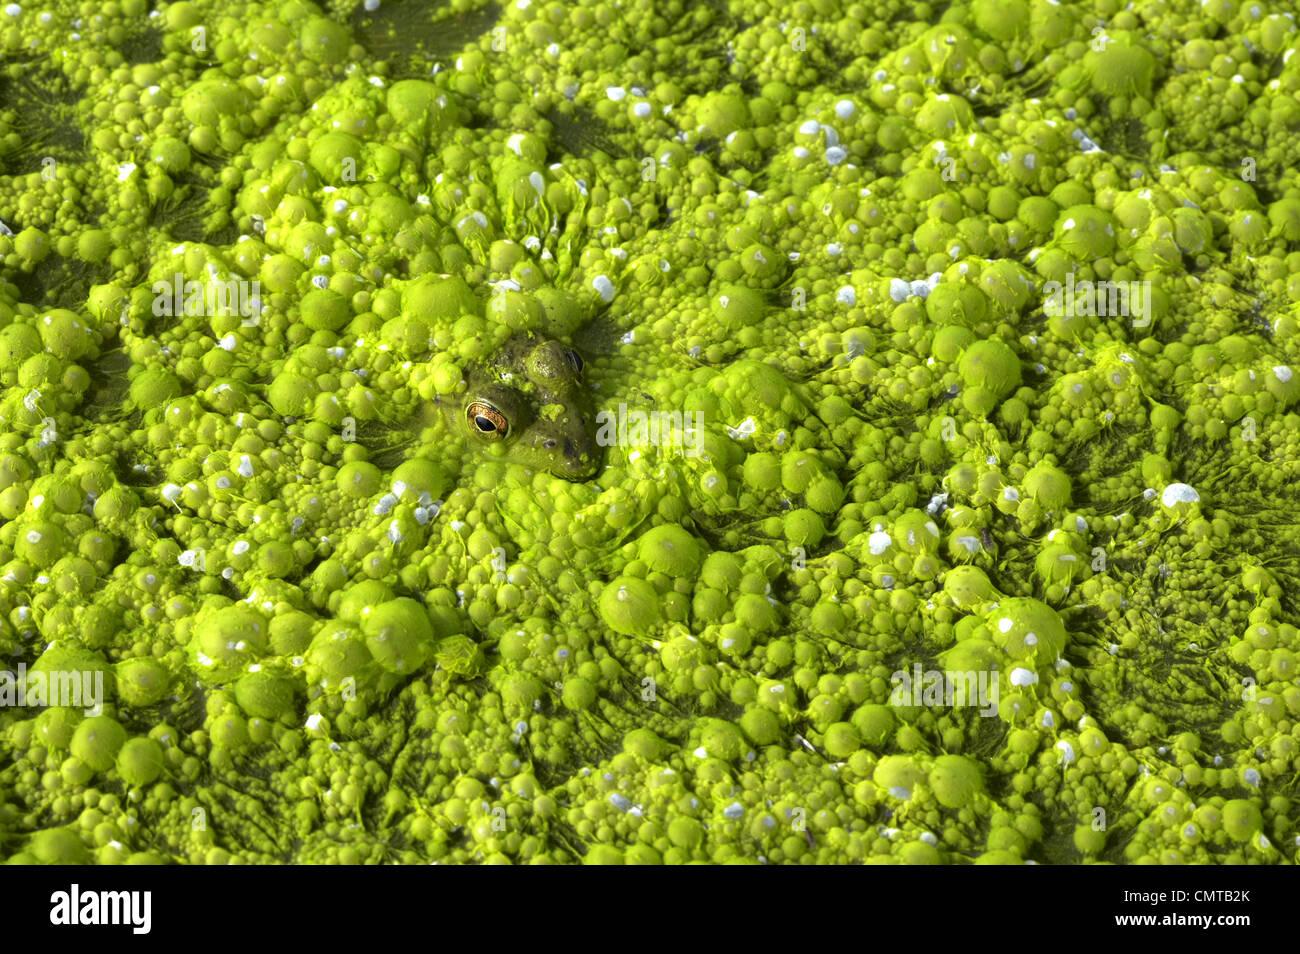 Close-up de grenouille dans l'étang vert visqueux, Georgian Bay, Ontario, Canada Banque D'Images